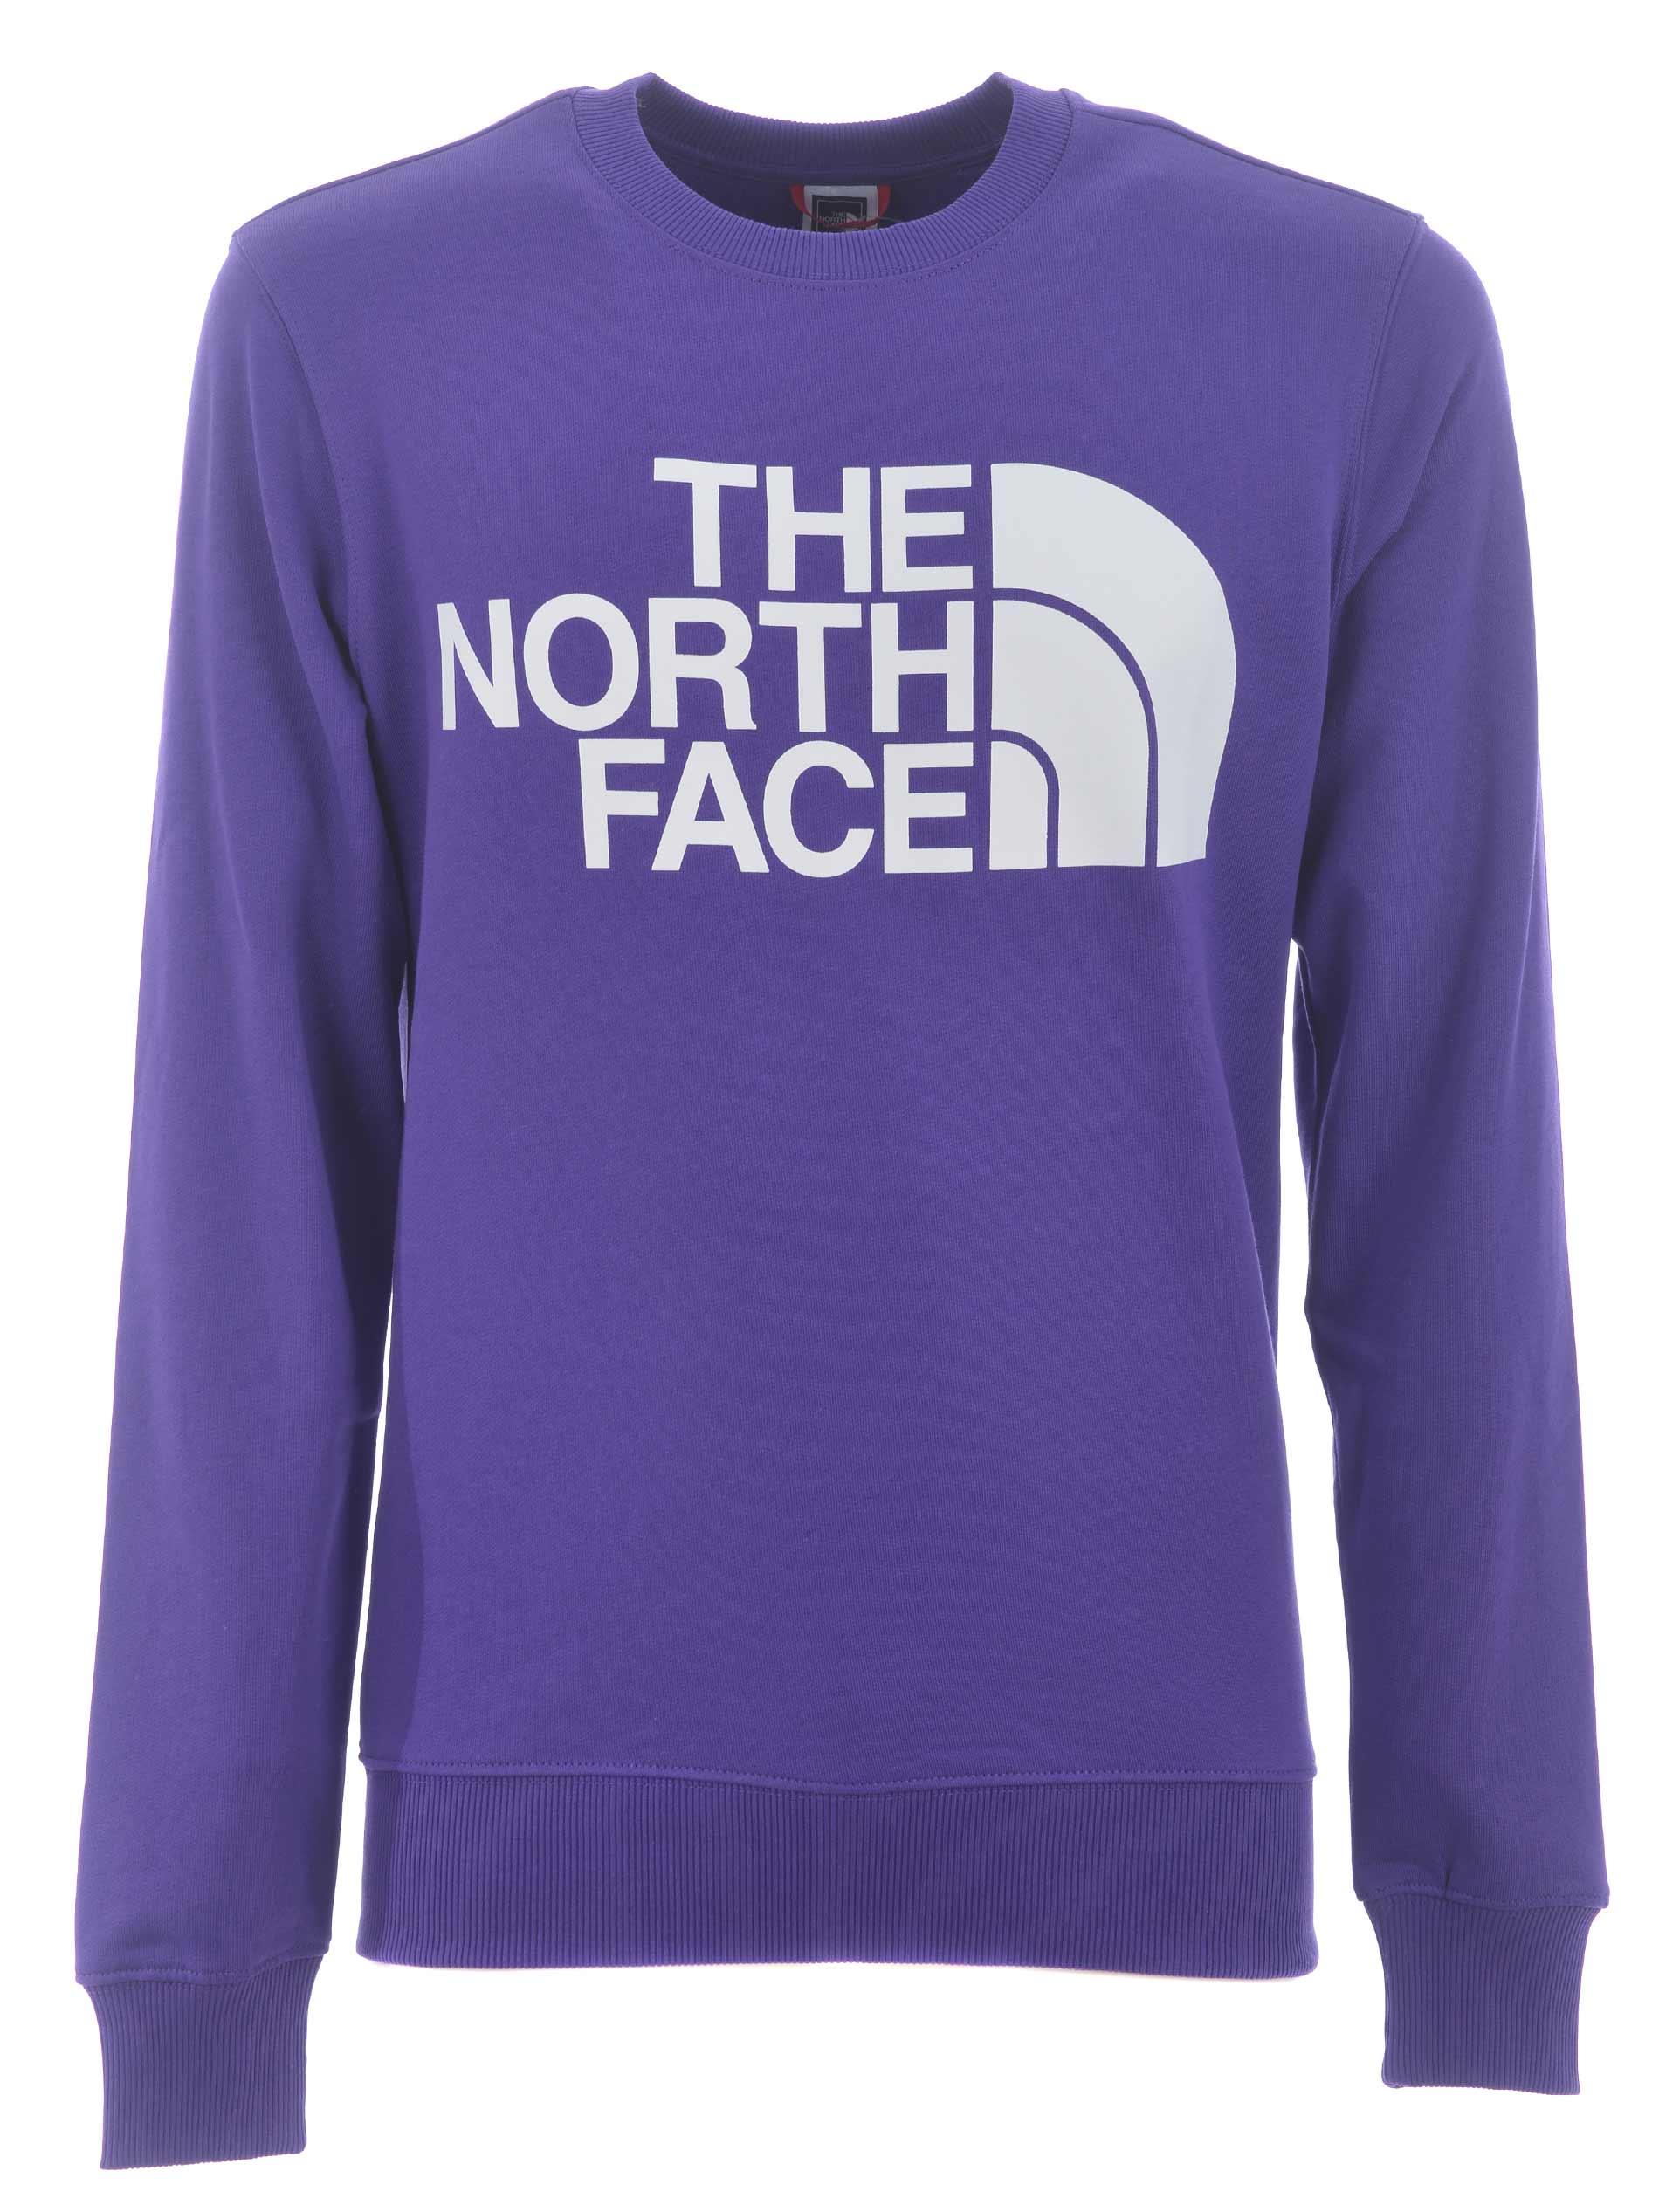 The North Face cotton sweatshirt